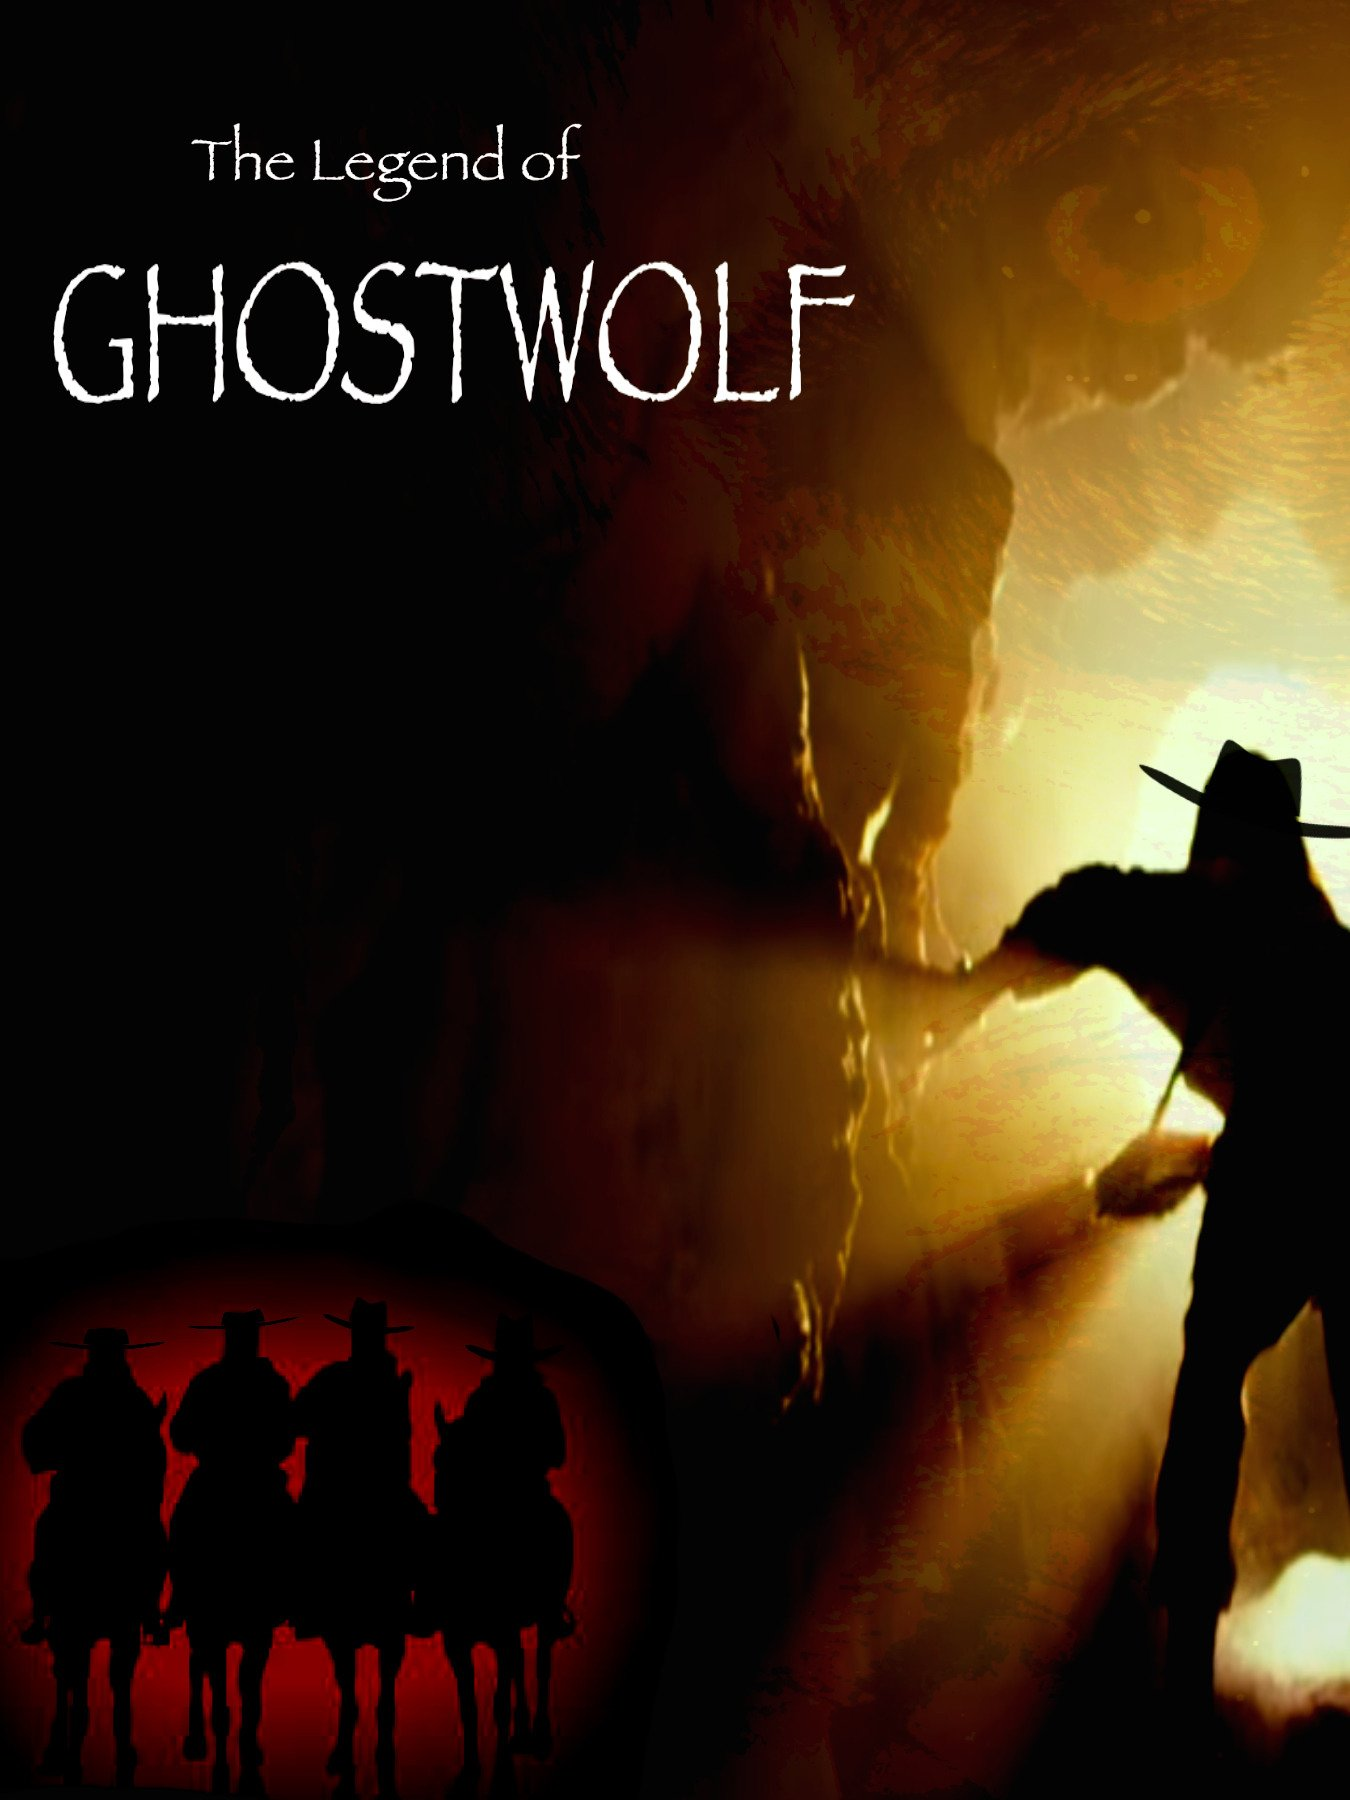 Ghostwolf, The Legend of